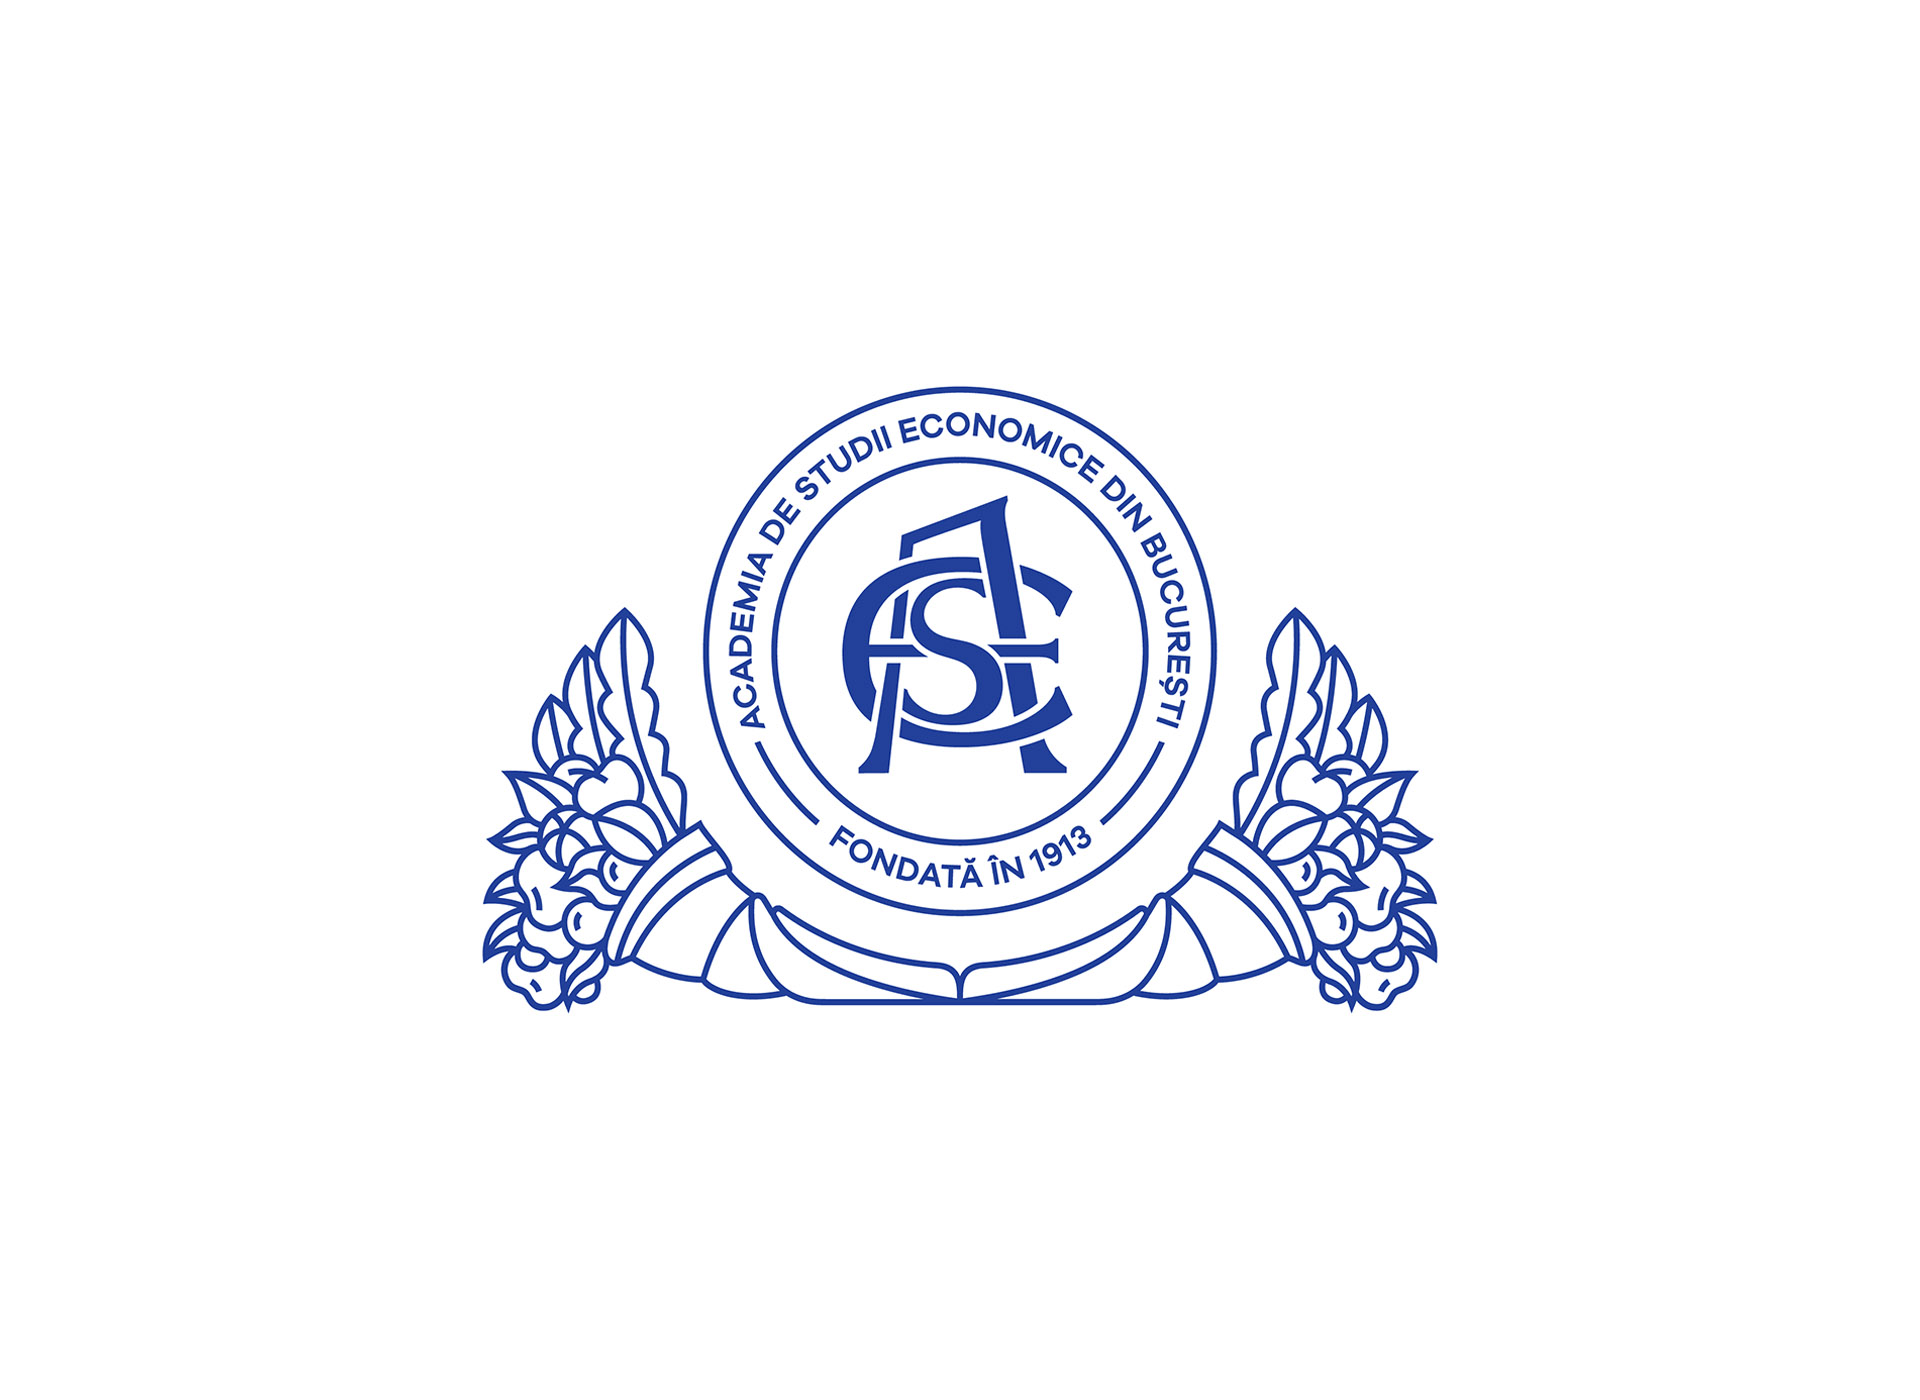 Academia de Studii Economie din Bucuresti portfolio inoveo logo pozitiv